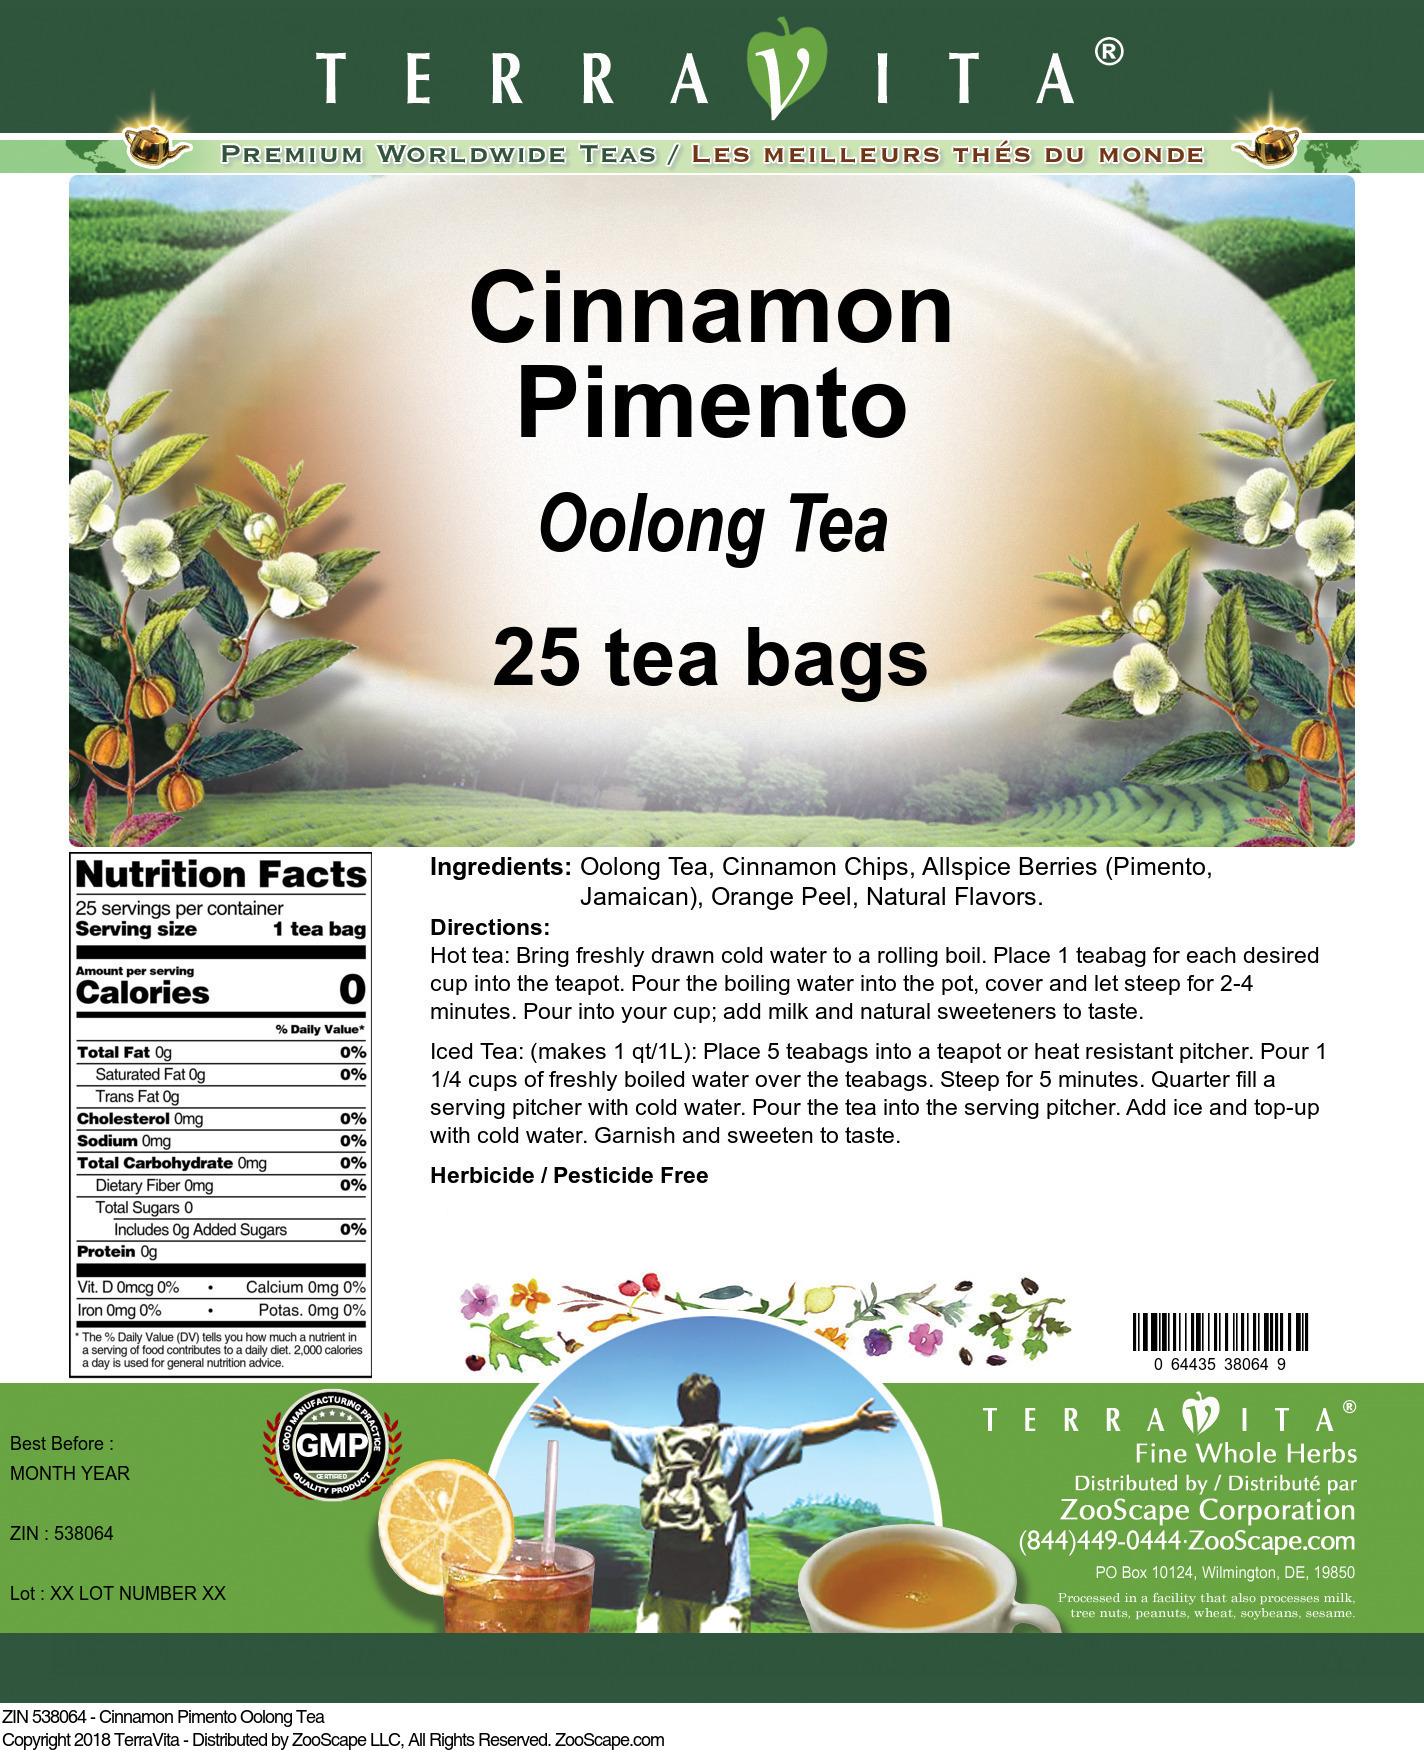 Cinnamon Pimento Oolong Tea